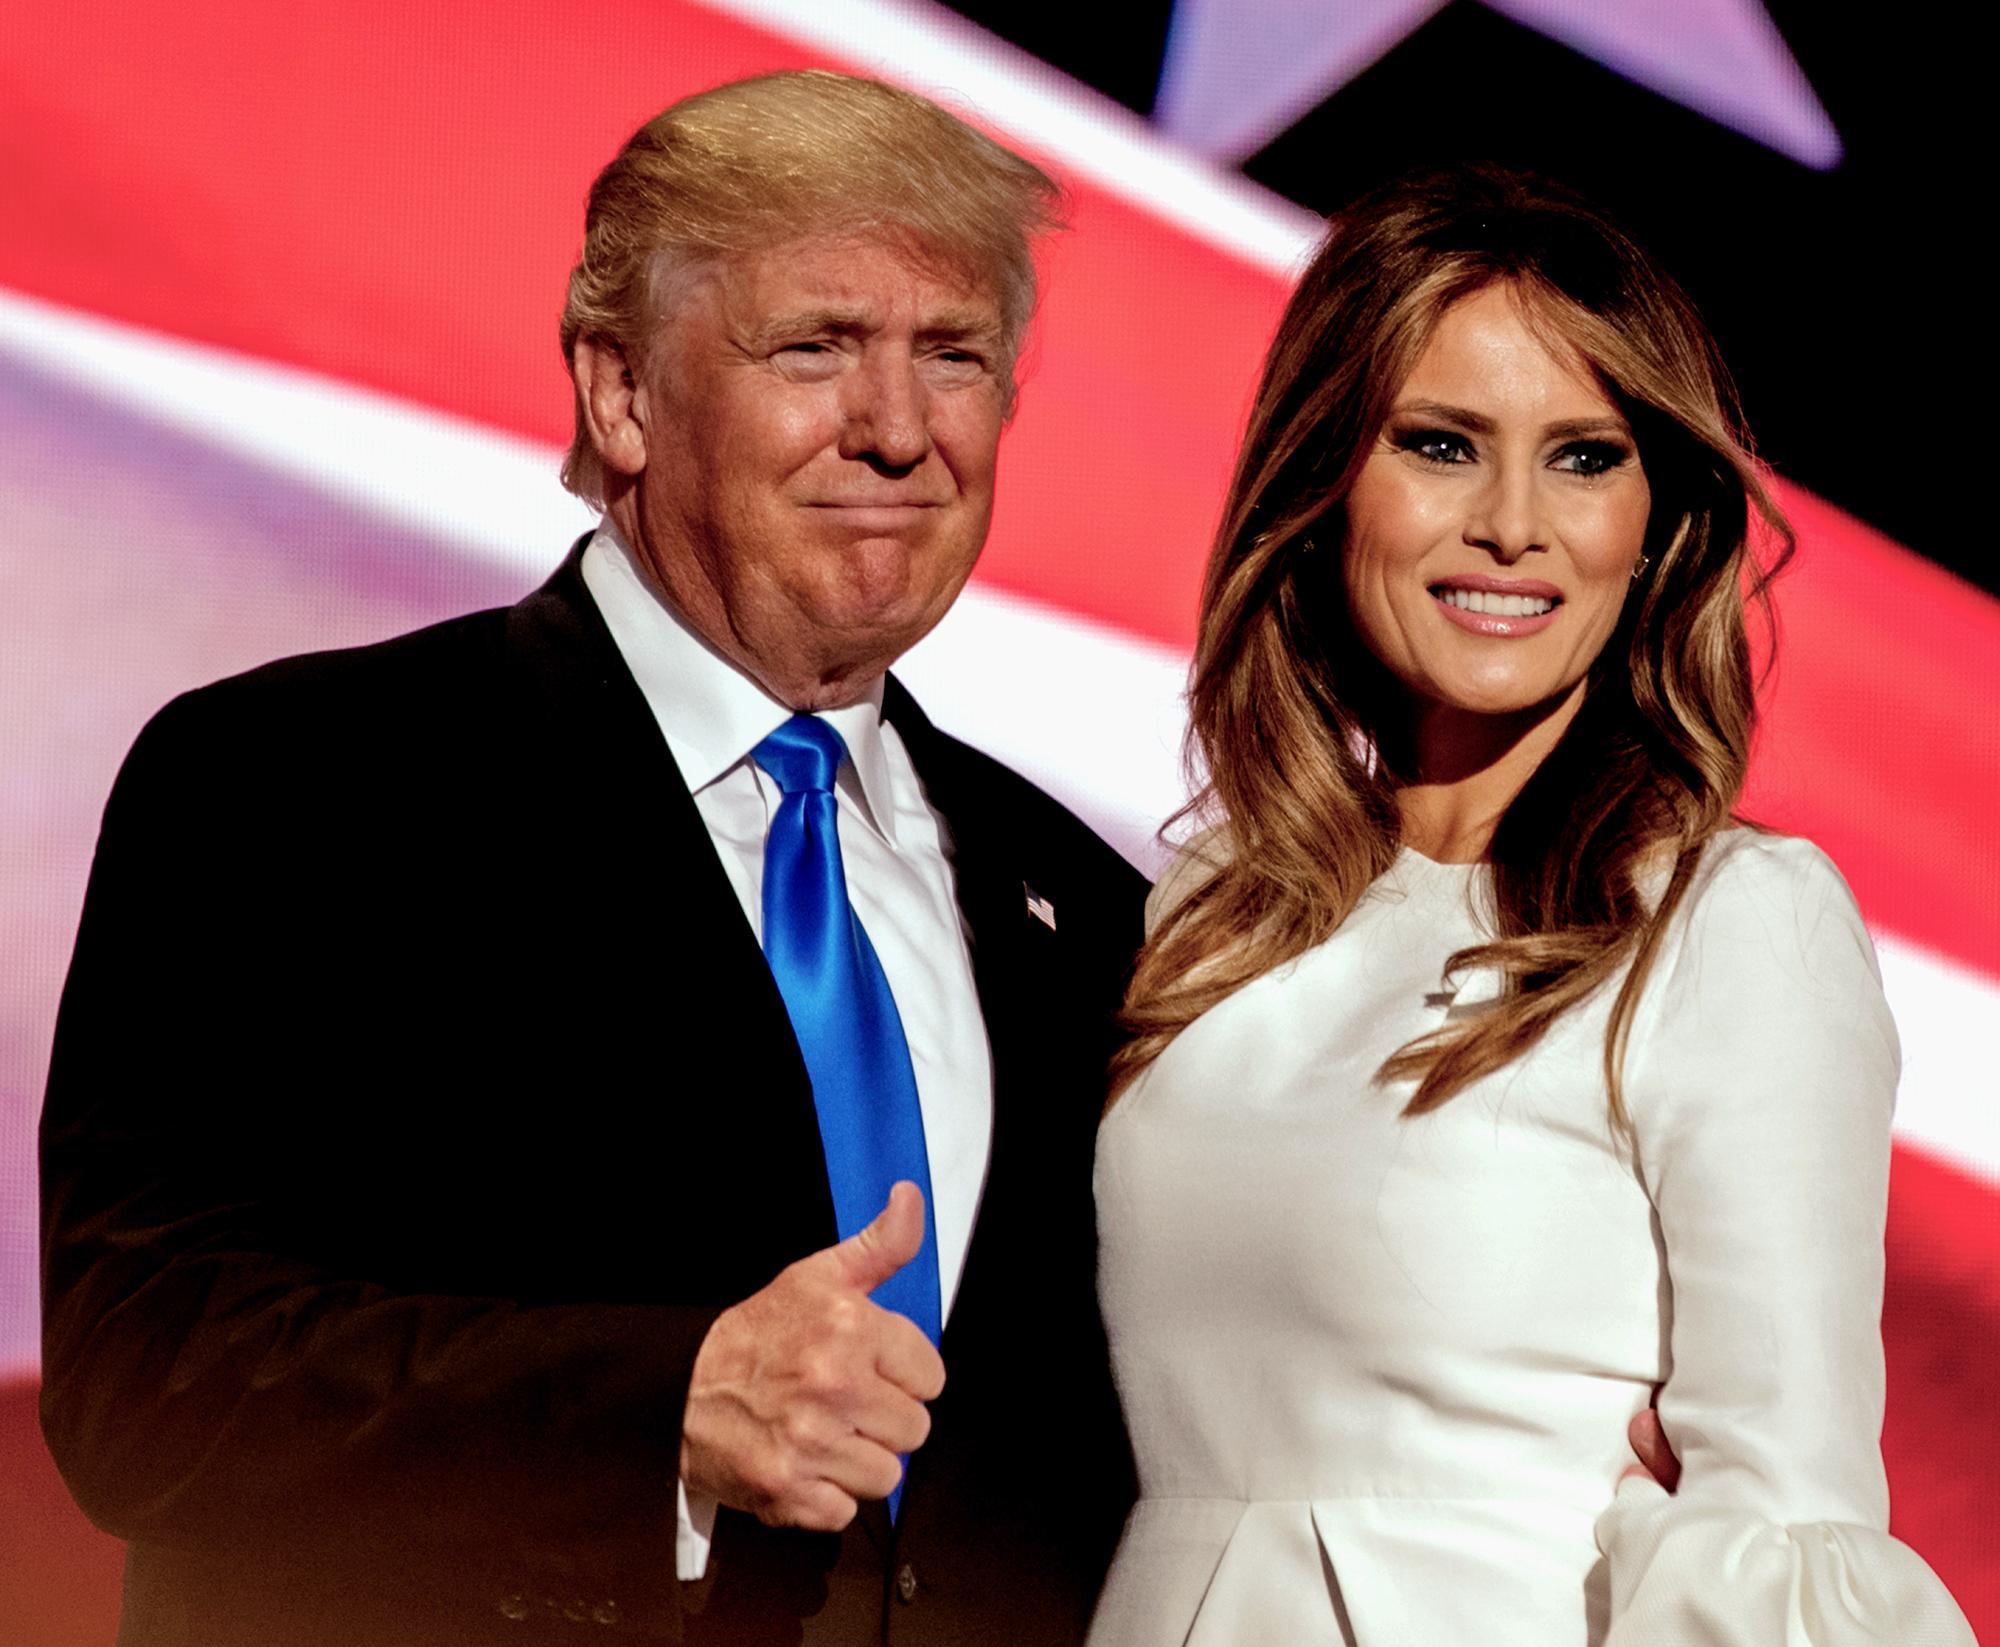 Donald Trump and his wife, Melania Trump